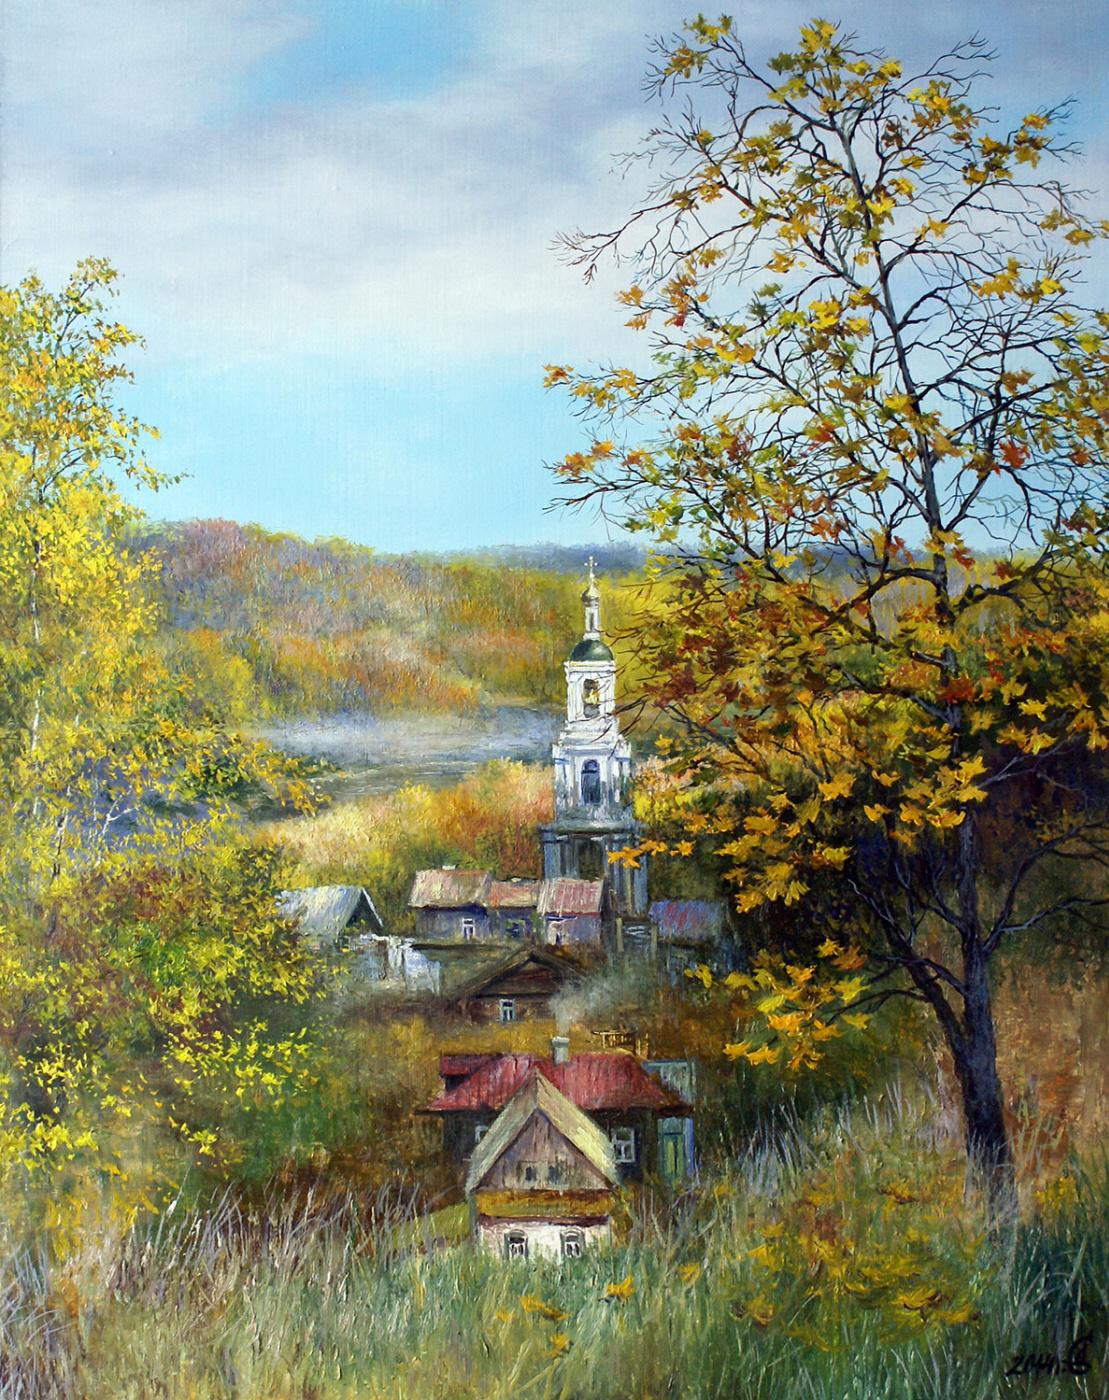 Сергей Владимирович Дорофеев. Autumn charm